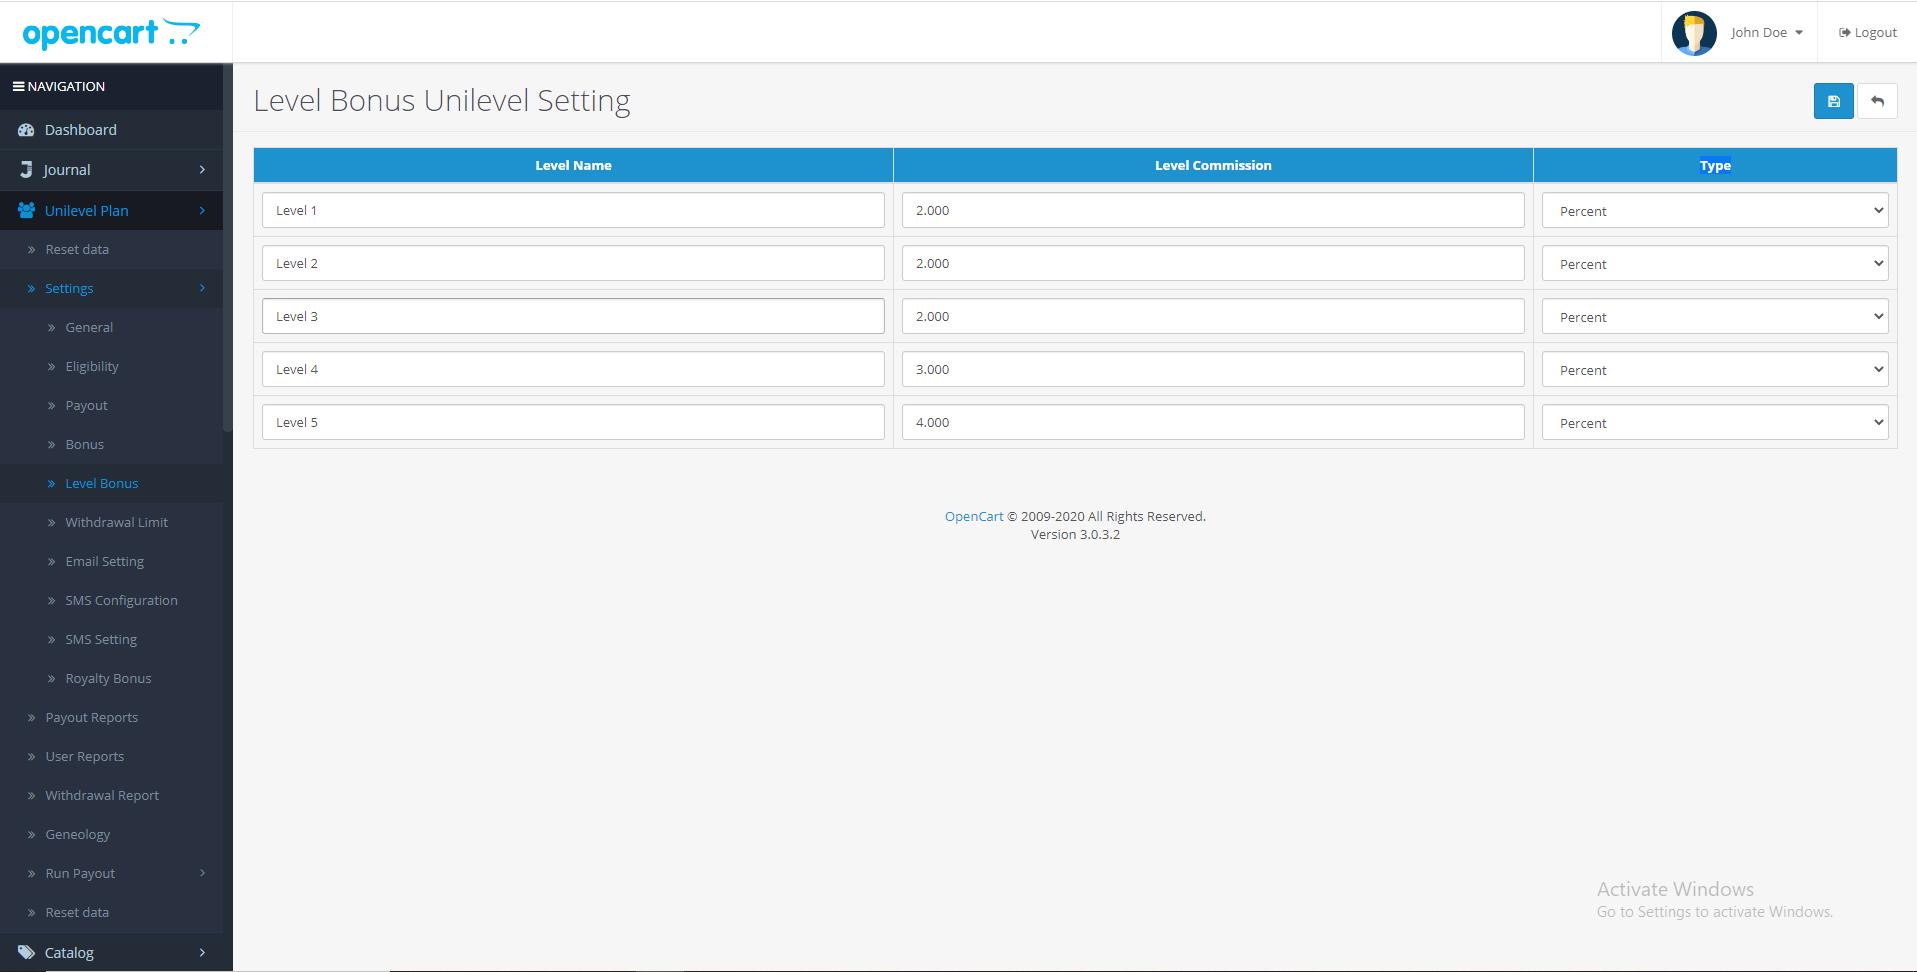 |'Opencart'| |'letscms'| |'opencart unilevel mlm plan'| |'bonus'| |'Dashboard'| |'unilevel mlm plan'| |'mlm'| |'mlm Plan'|  |'setting'| |'new users'| |'unilevel'| |'unilevel mlm extension'| |'costomer list'| |'new users'| |'Installer'| |'mlmtrees.com'| |'mlm plan'| |'extension'| |'Opencart mlm plan'|